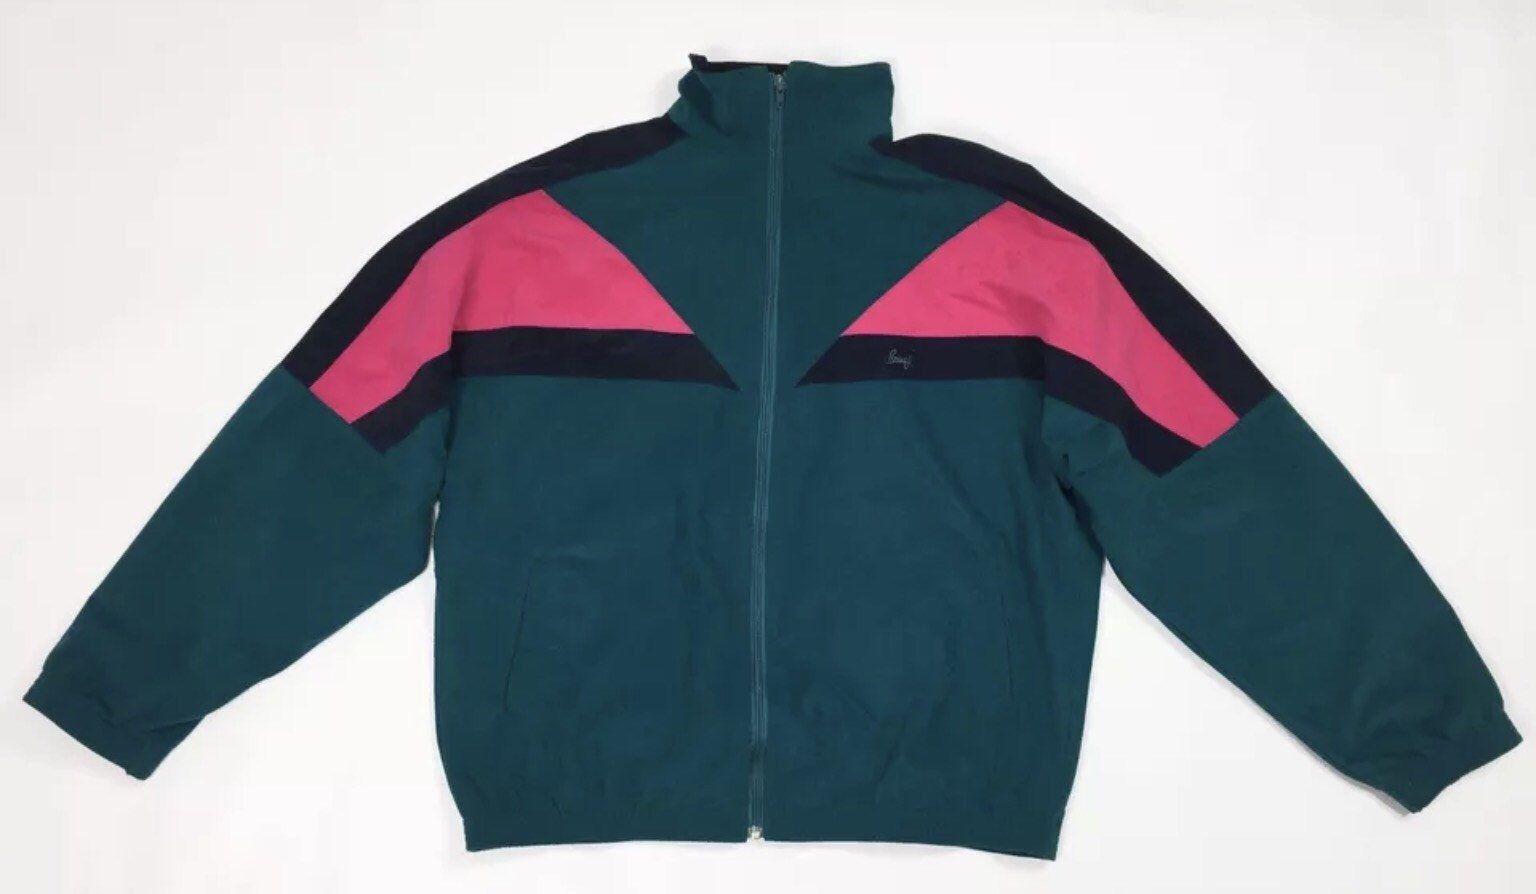 unisex Brugi uomo verde usato XL felpa giacca vintage tuta jacket 60R1w6 f5828f25bb1